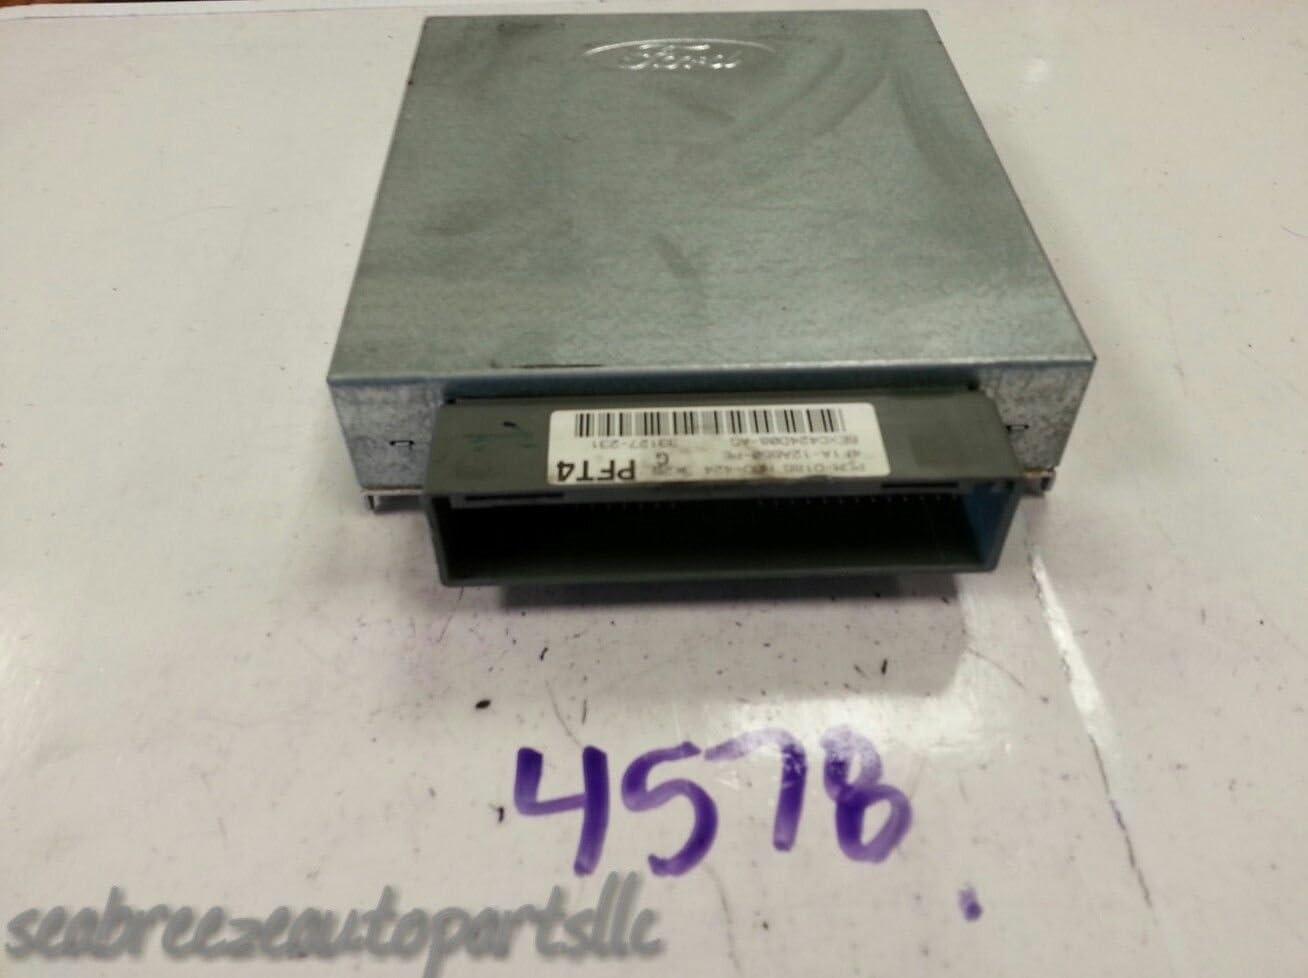 2004 Ford Taurus 3.0L 4F1A-12A650-PD Engine Computer ECM PCM ECU HBO-424